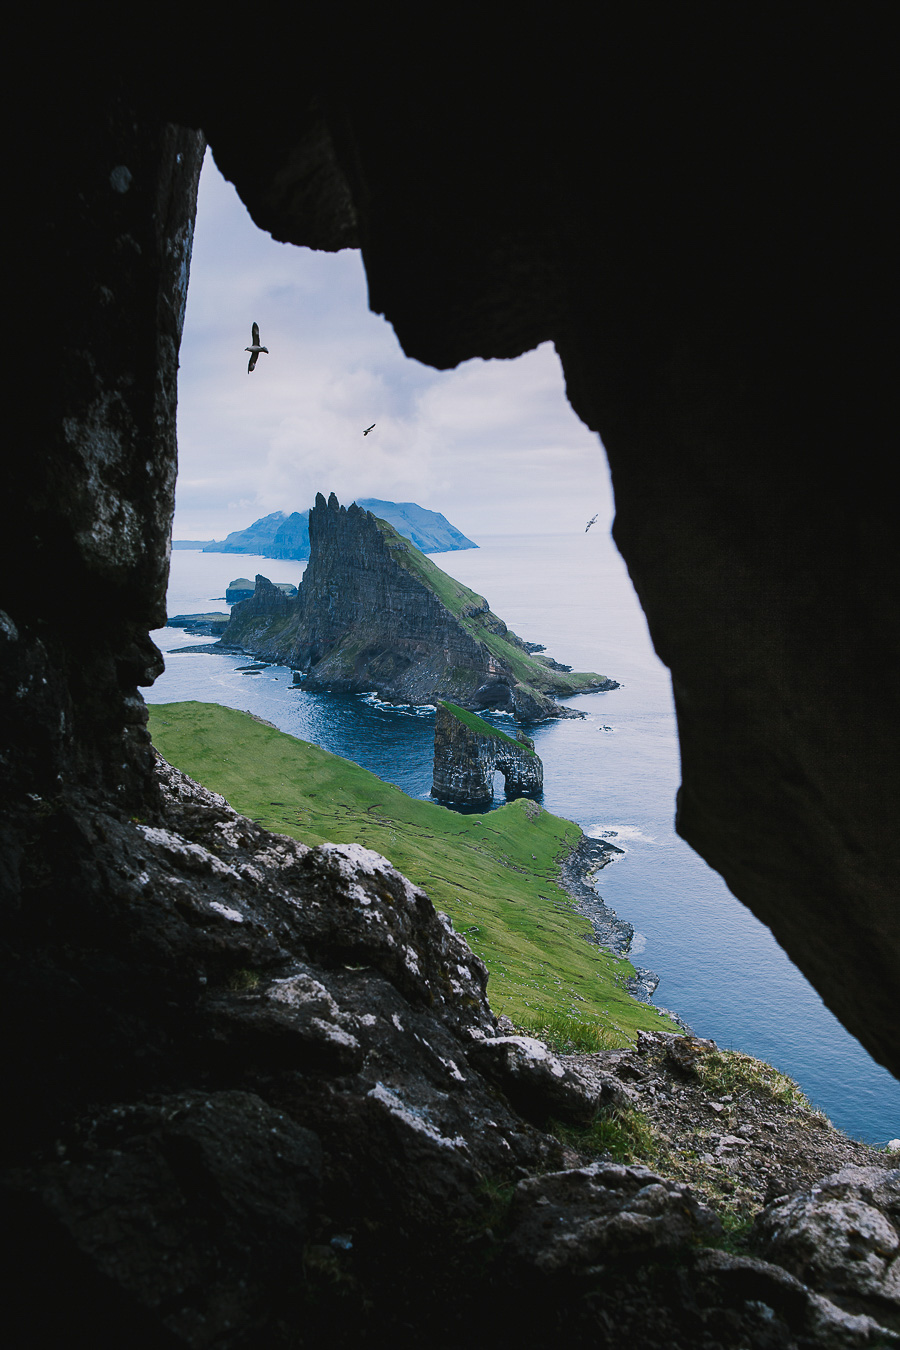 Drangarnir in Faroe Islands caved in